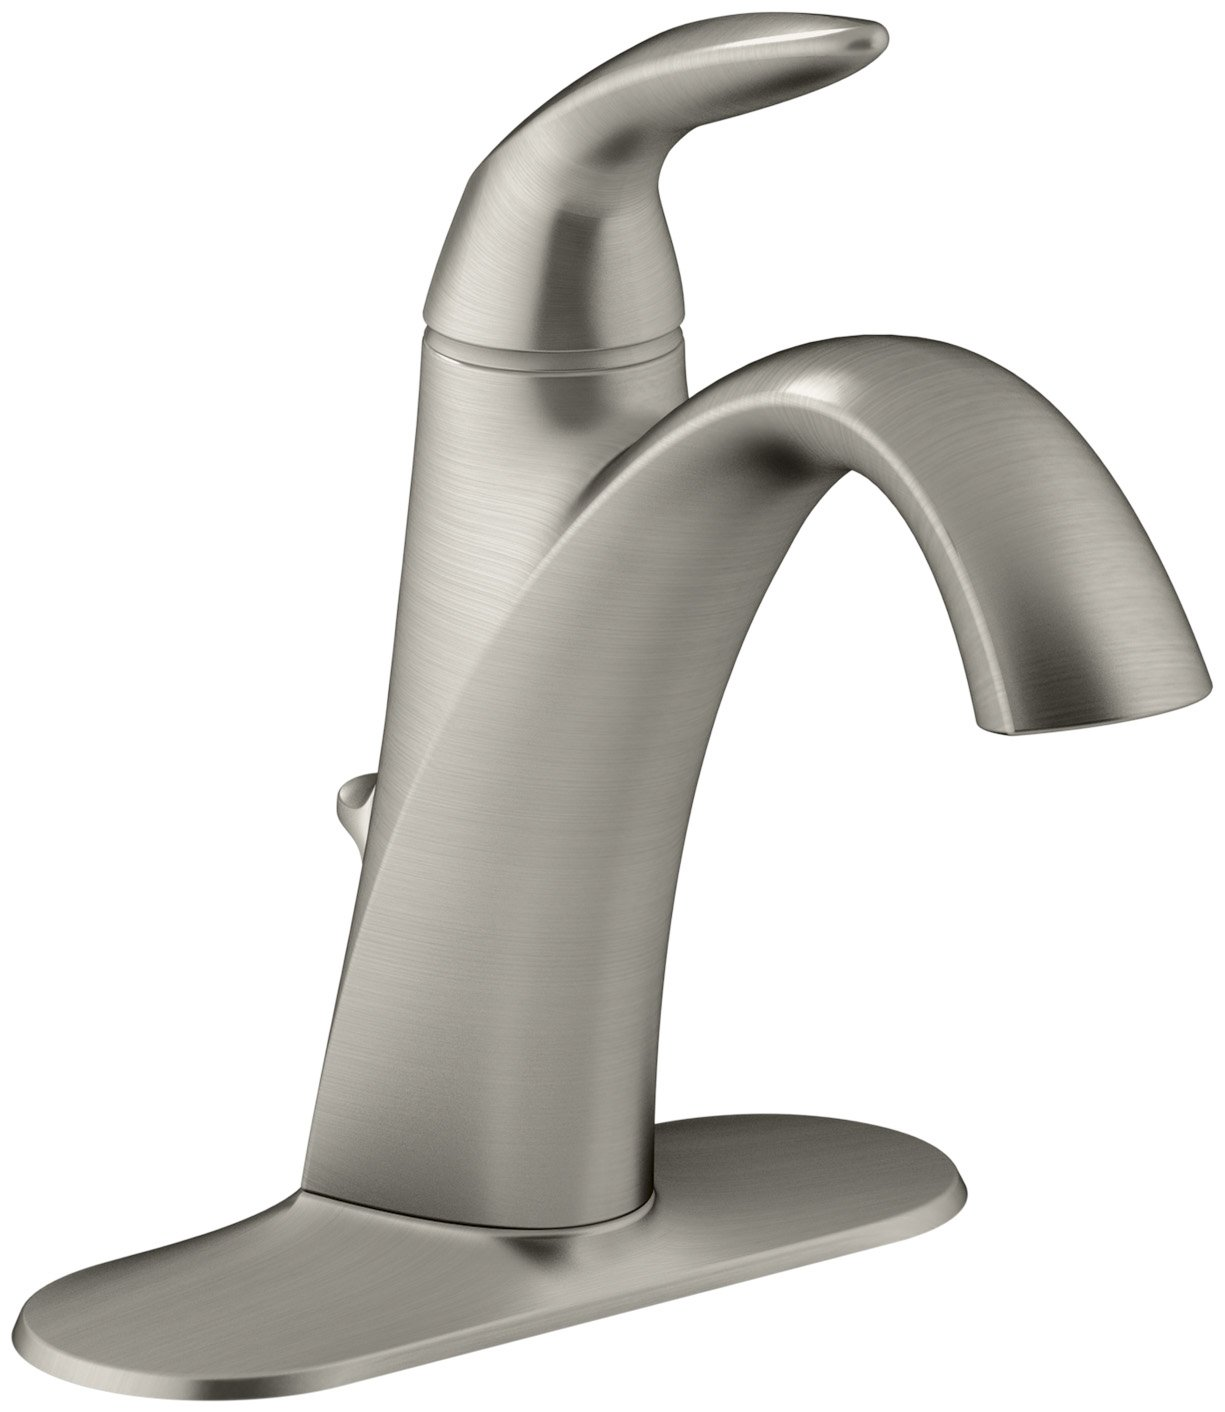 kohler k 45800 4 bn alteo single handle bathroom sink faucet